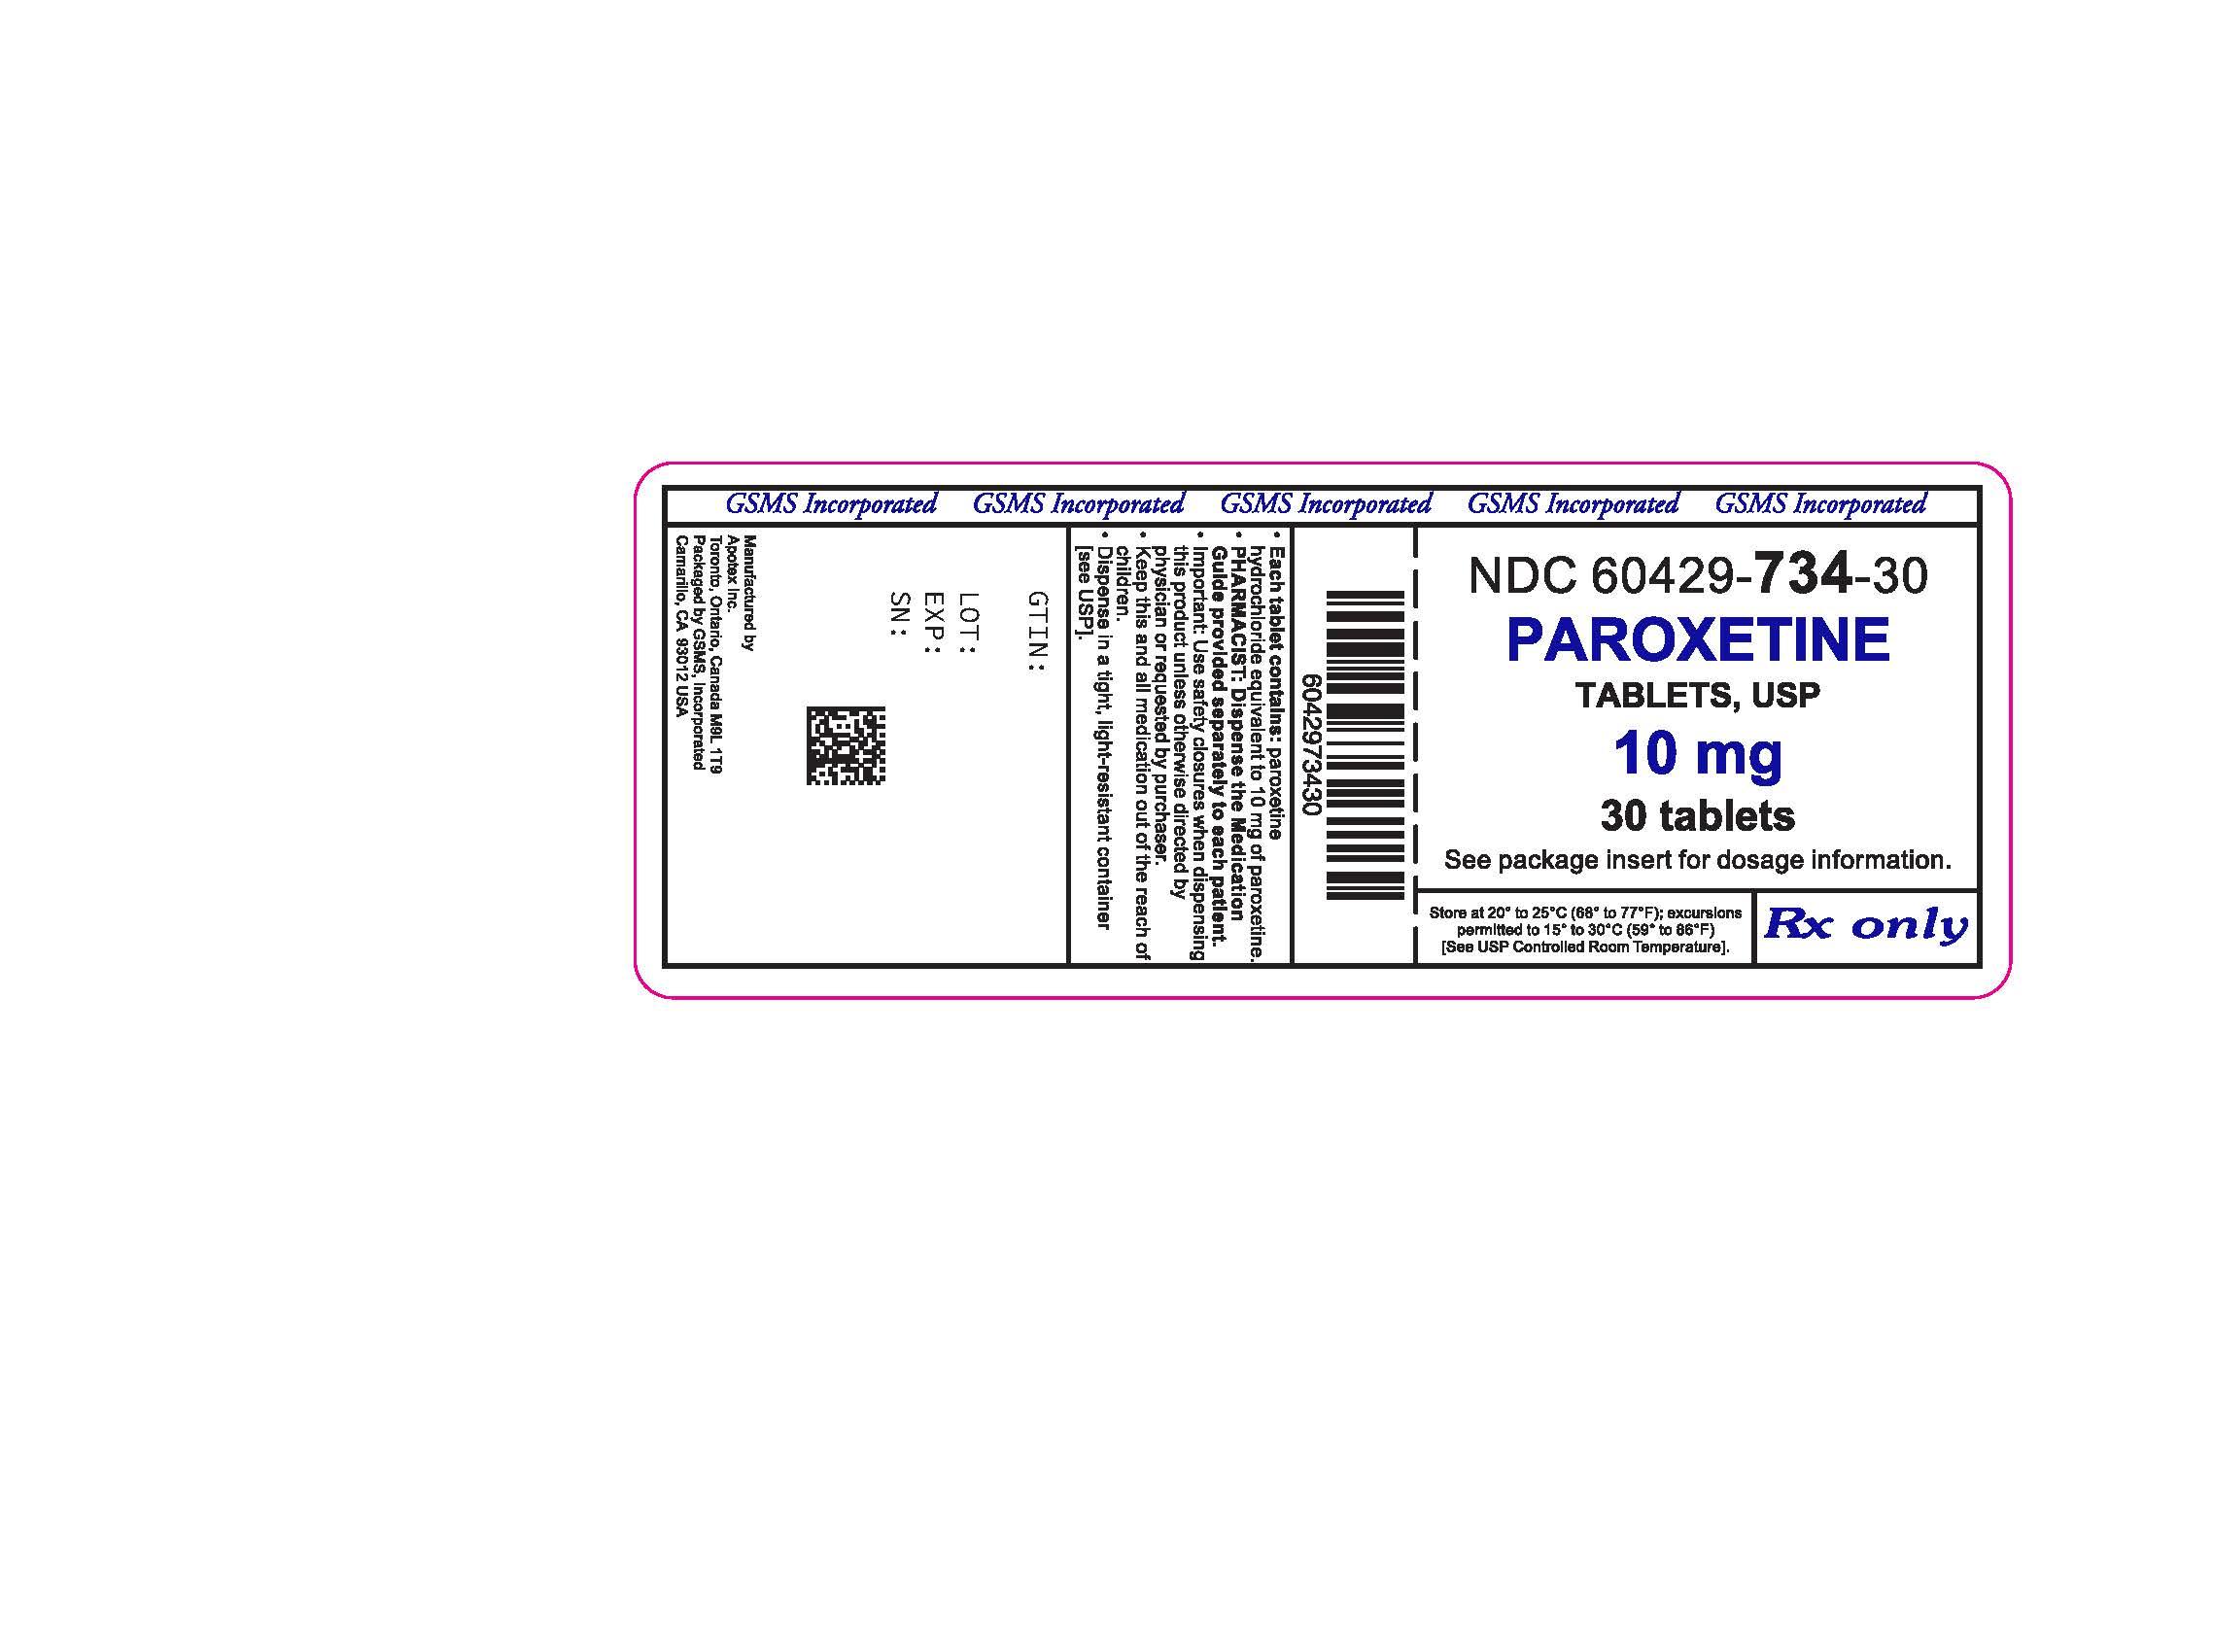 60429-734-30LB - PAROXETINE HCl 10 MG TABS 2.jpg